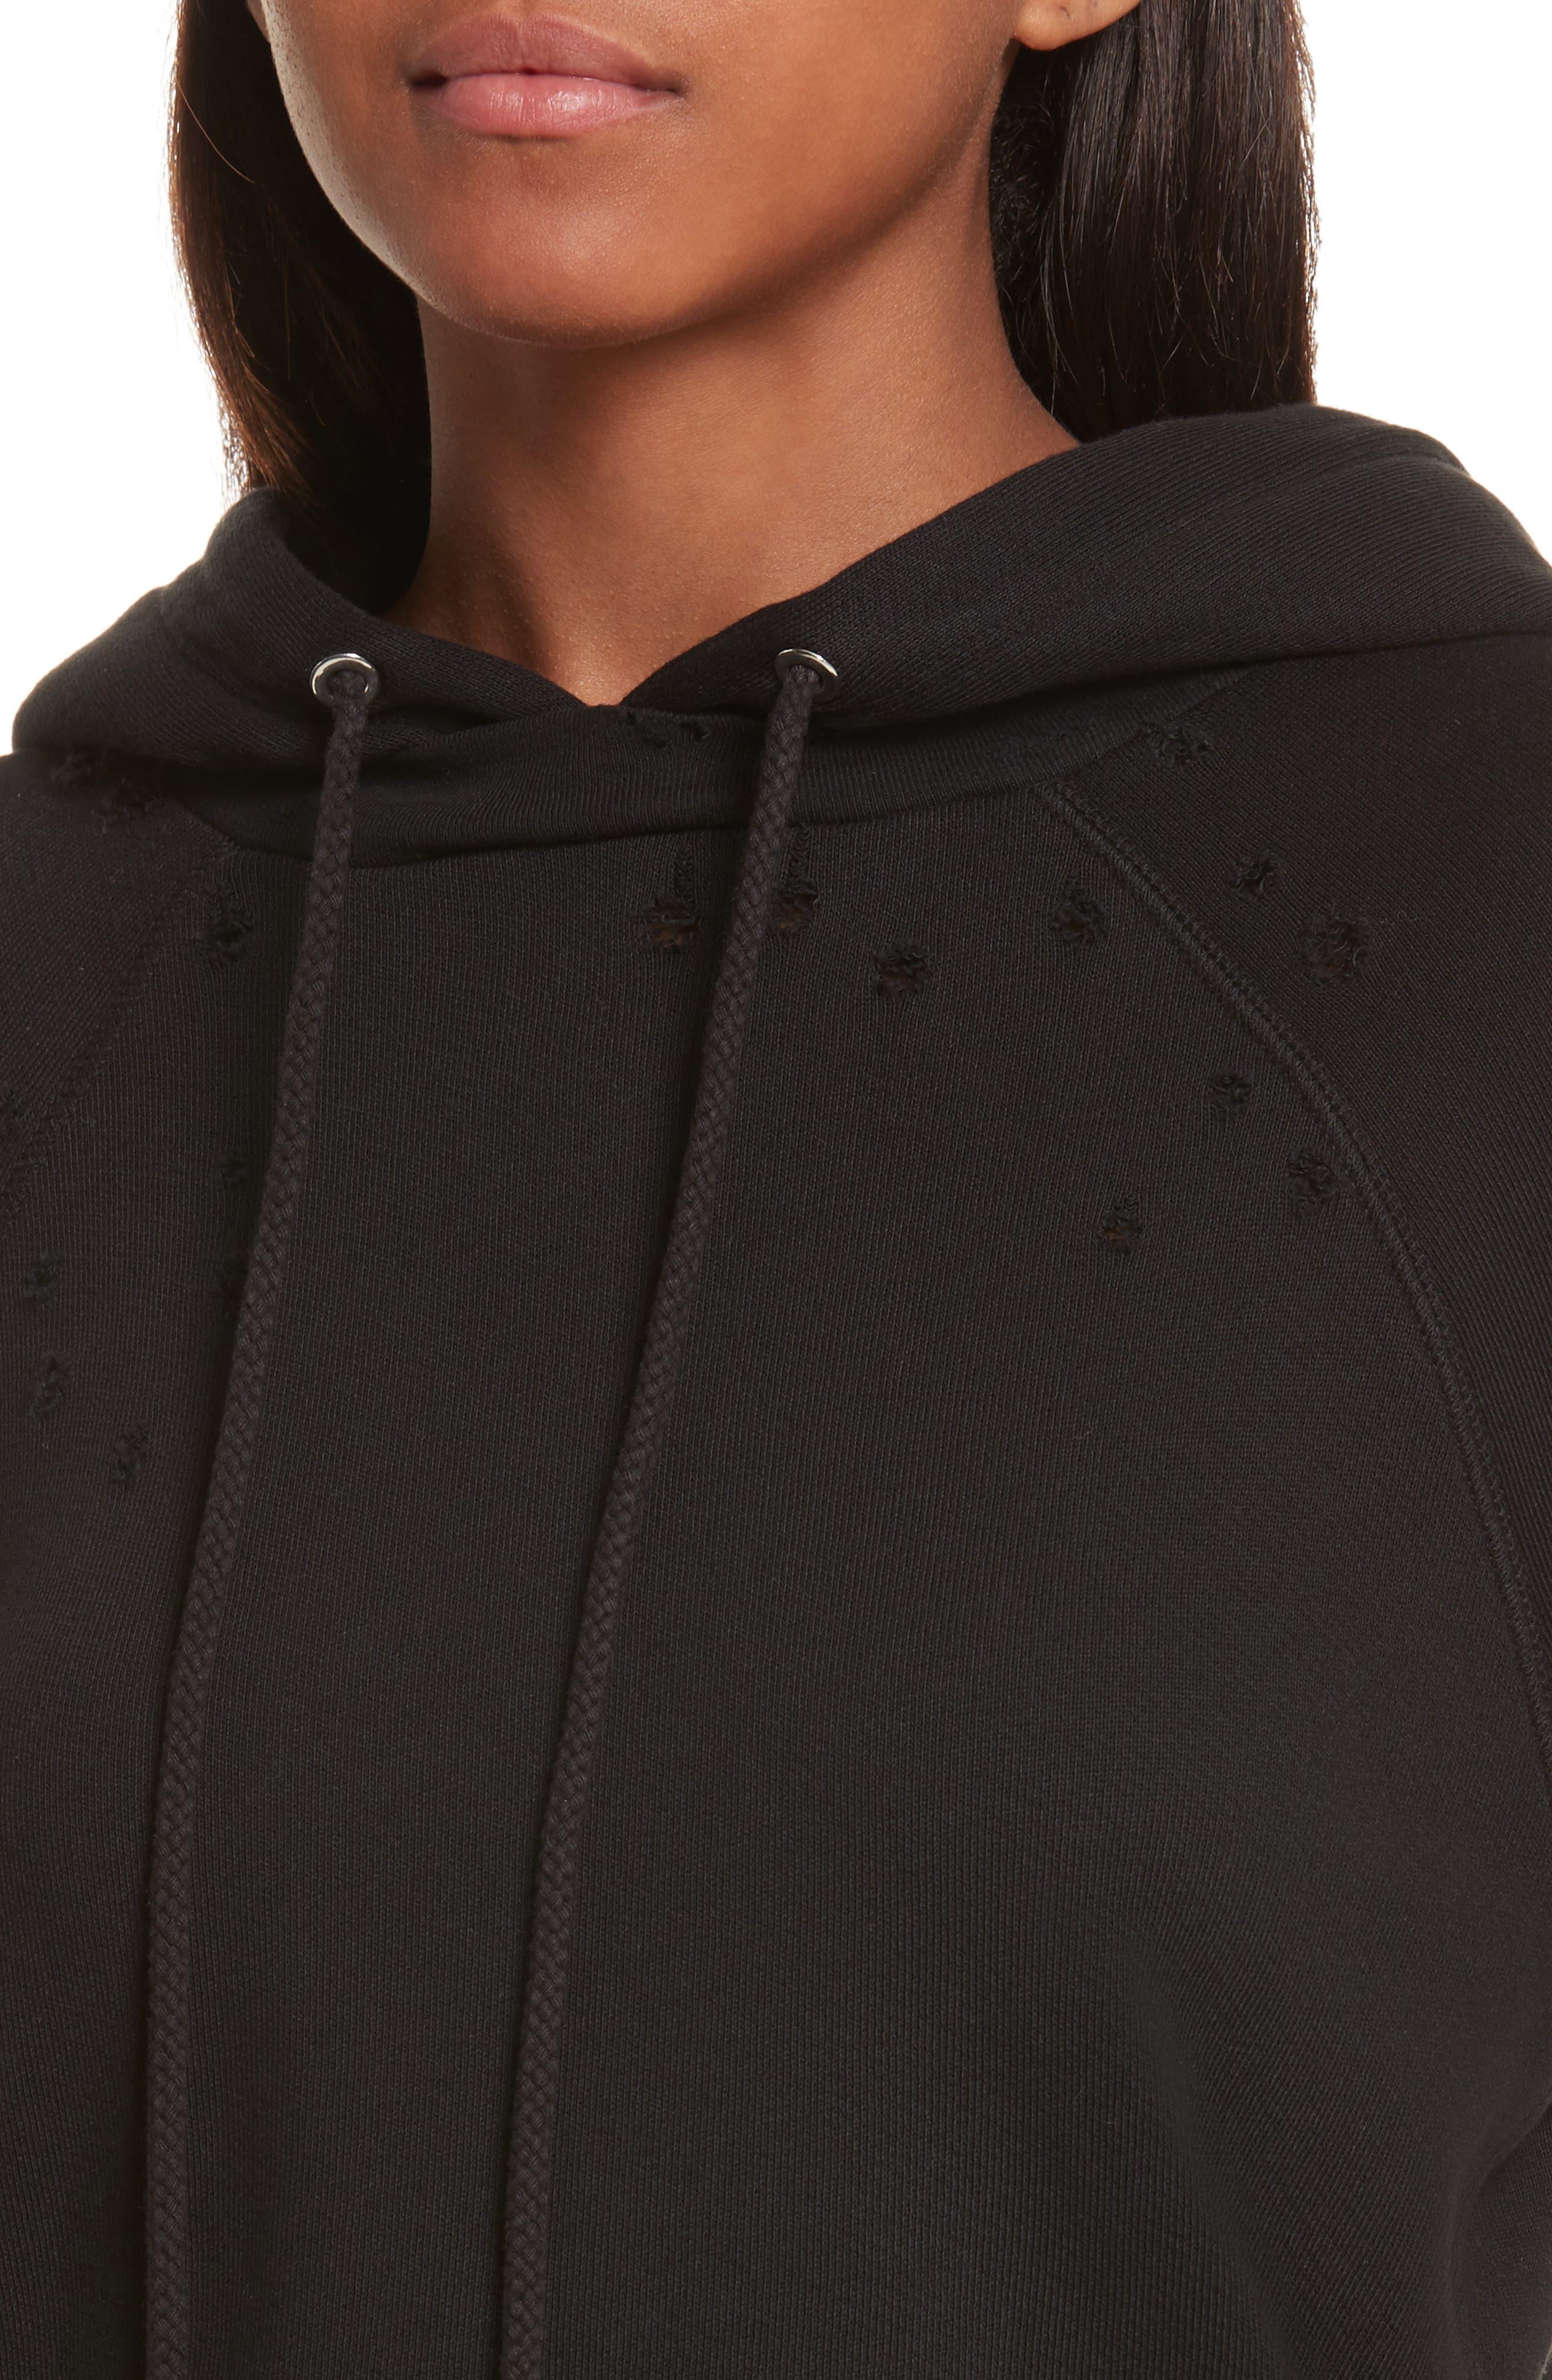 Shrunken Cotton Sweatshirt,                             Alternate thumbnail 4, color,                             Black